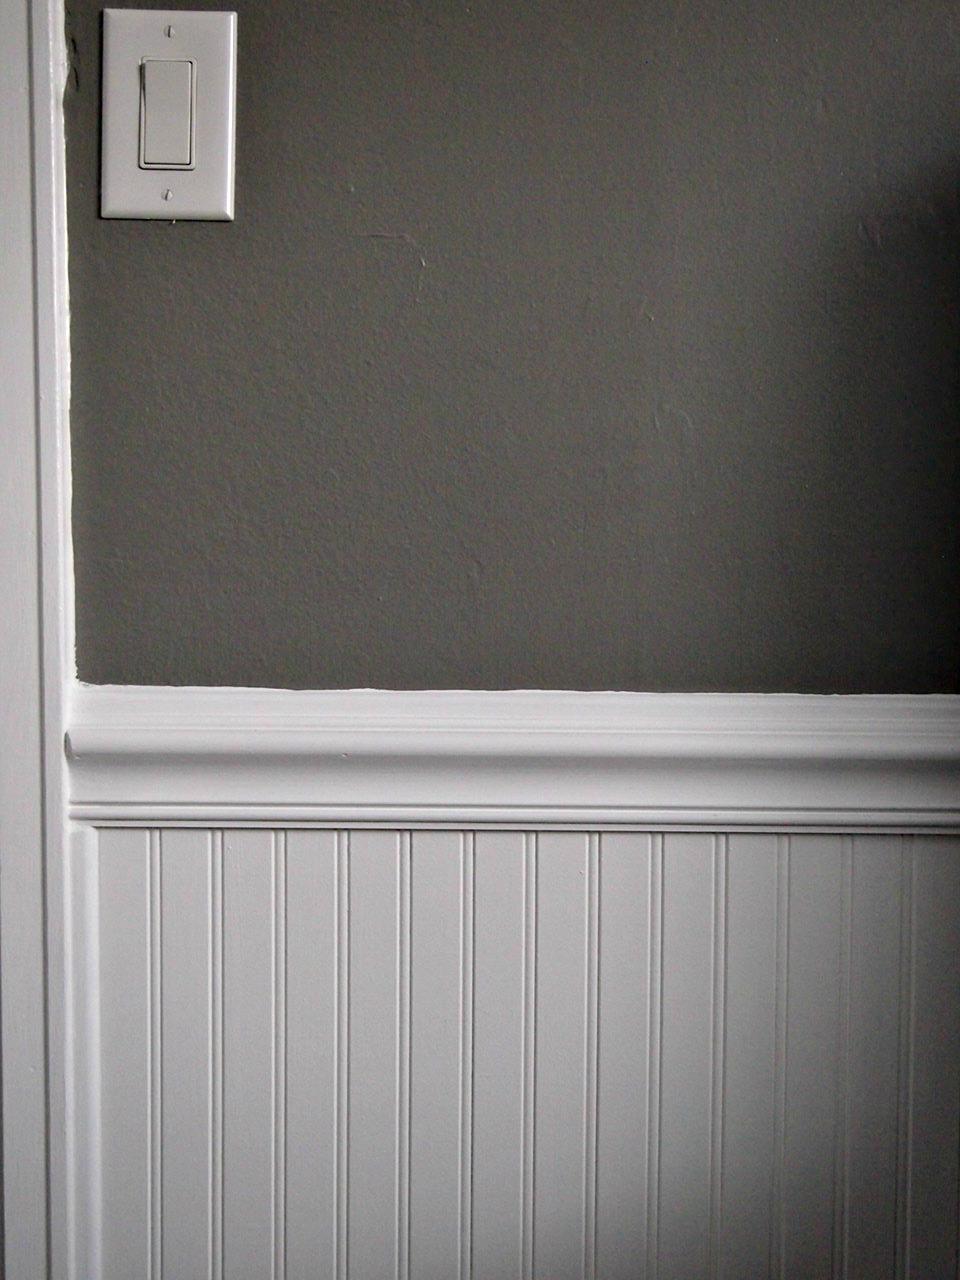 Martha Stewart Cement Gray Paint : Liv e july